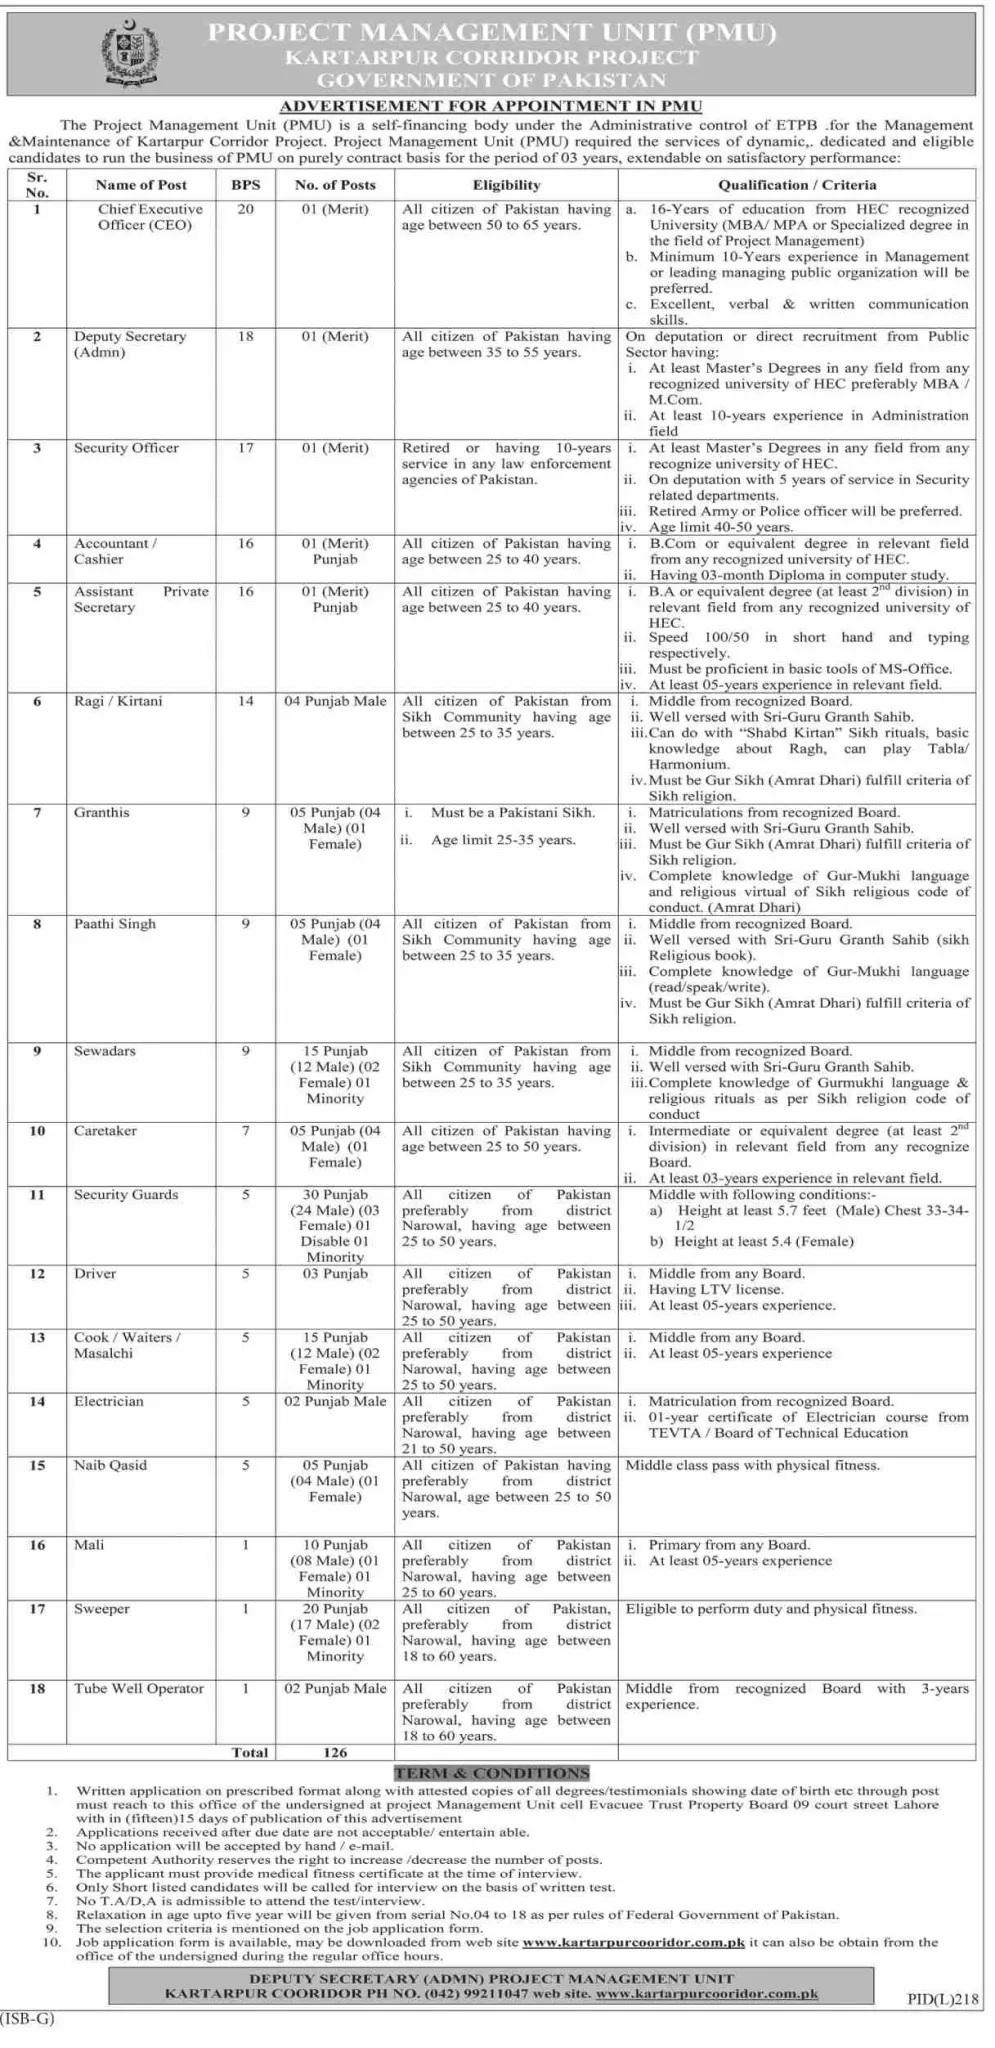 Kartarpur Corridor Project Management Unit PMU Jobs 2021